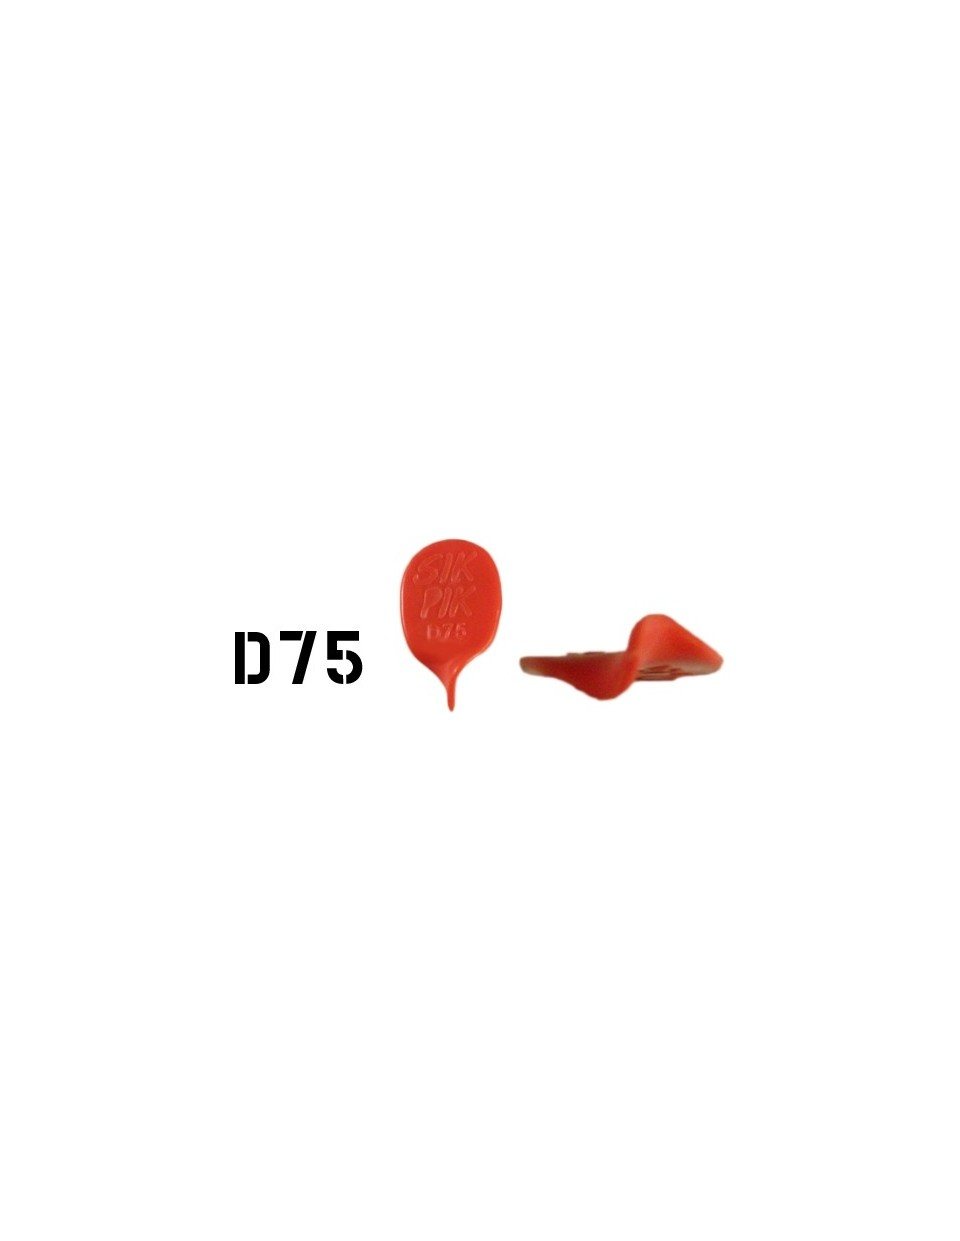 SikPik Red D75